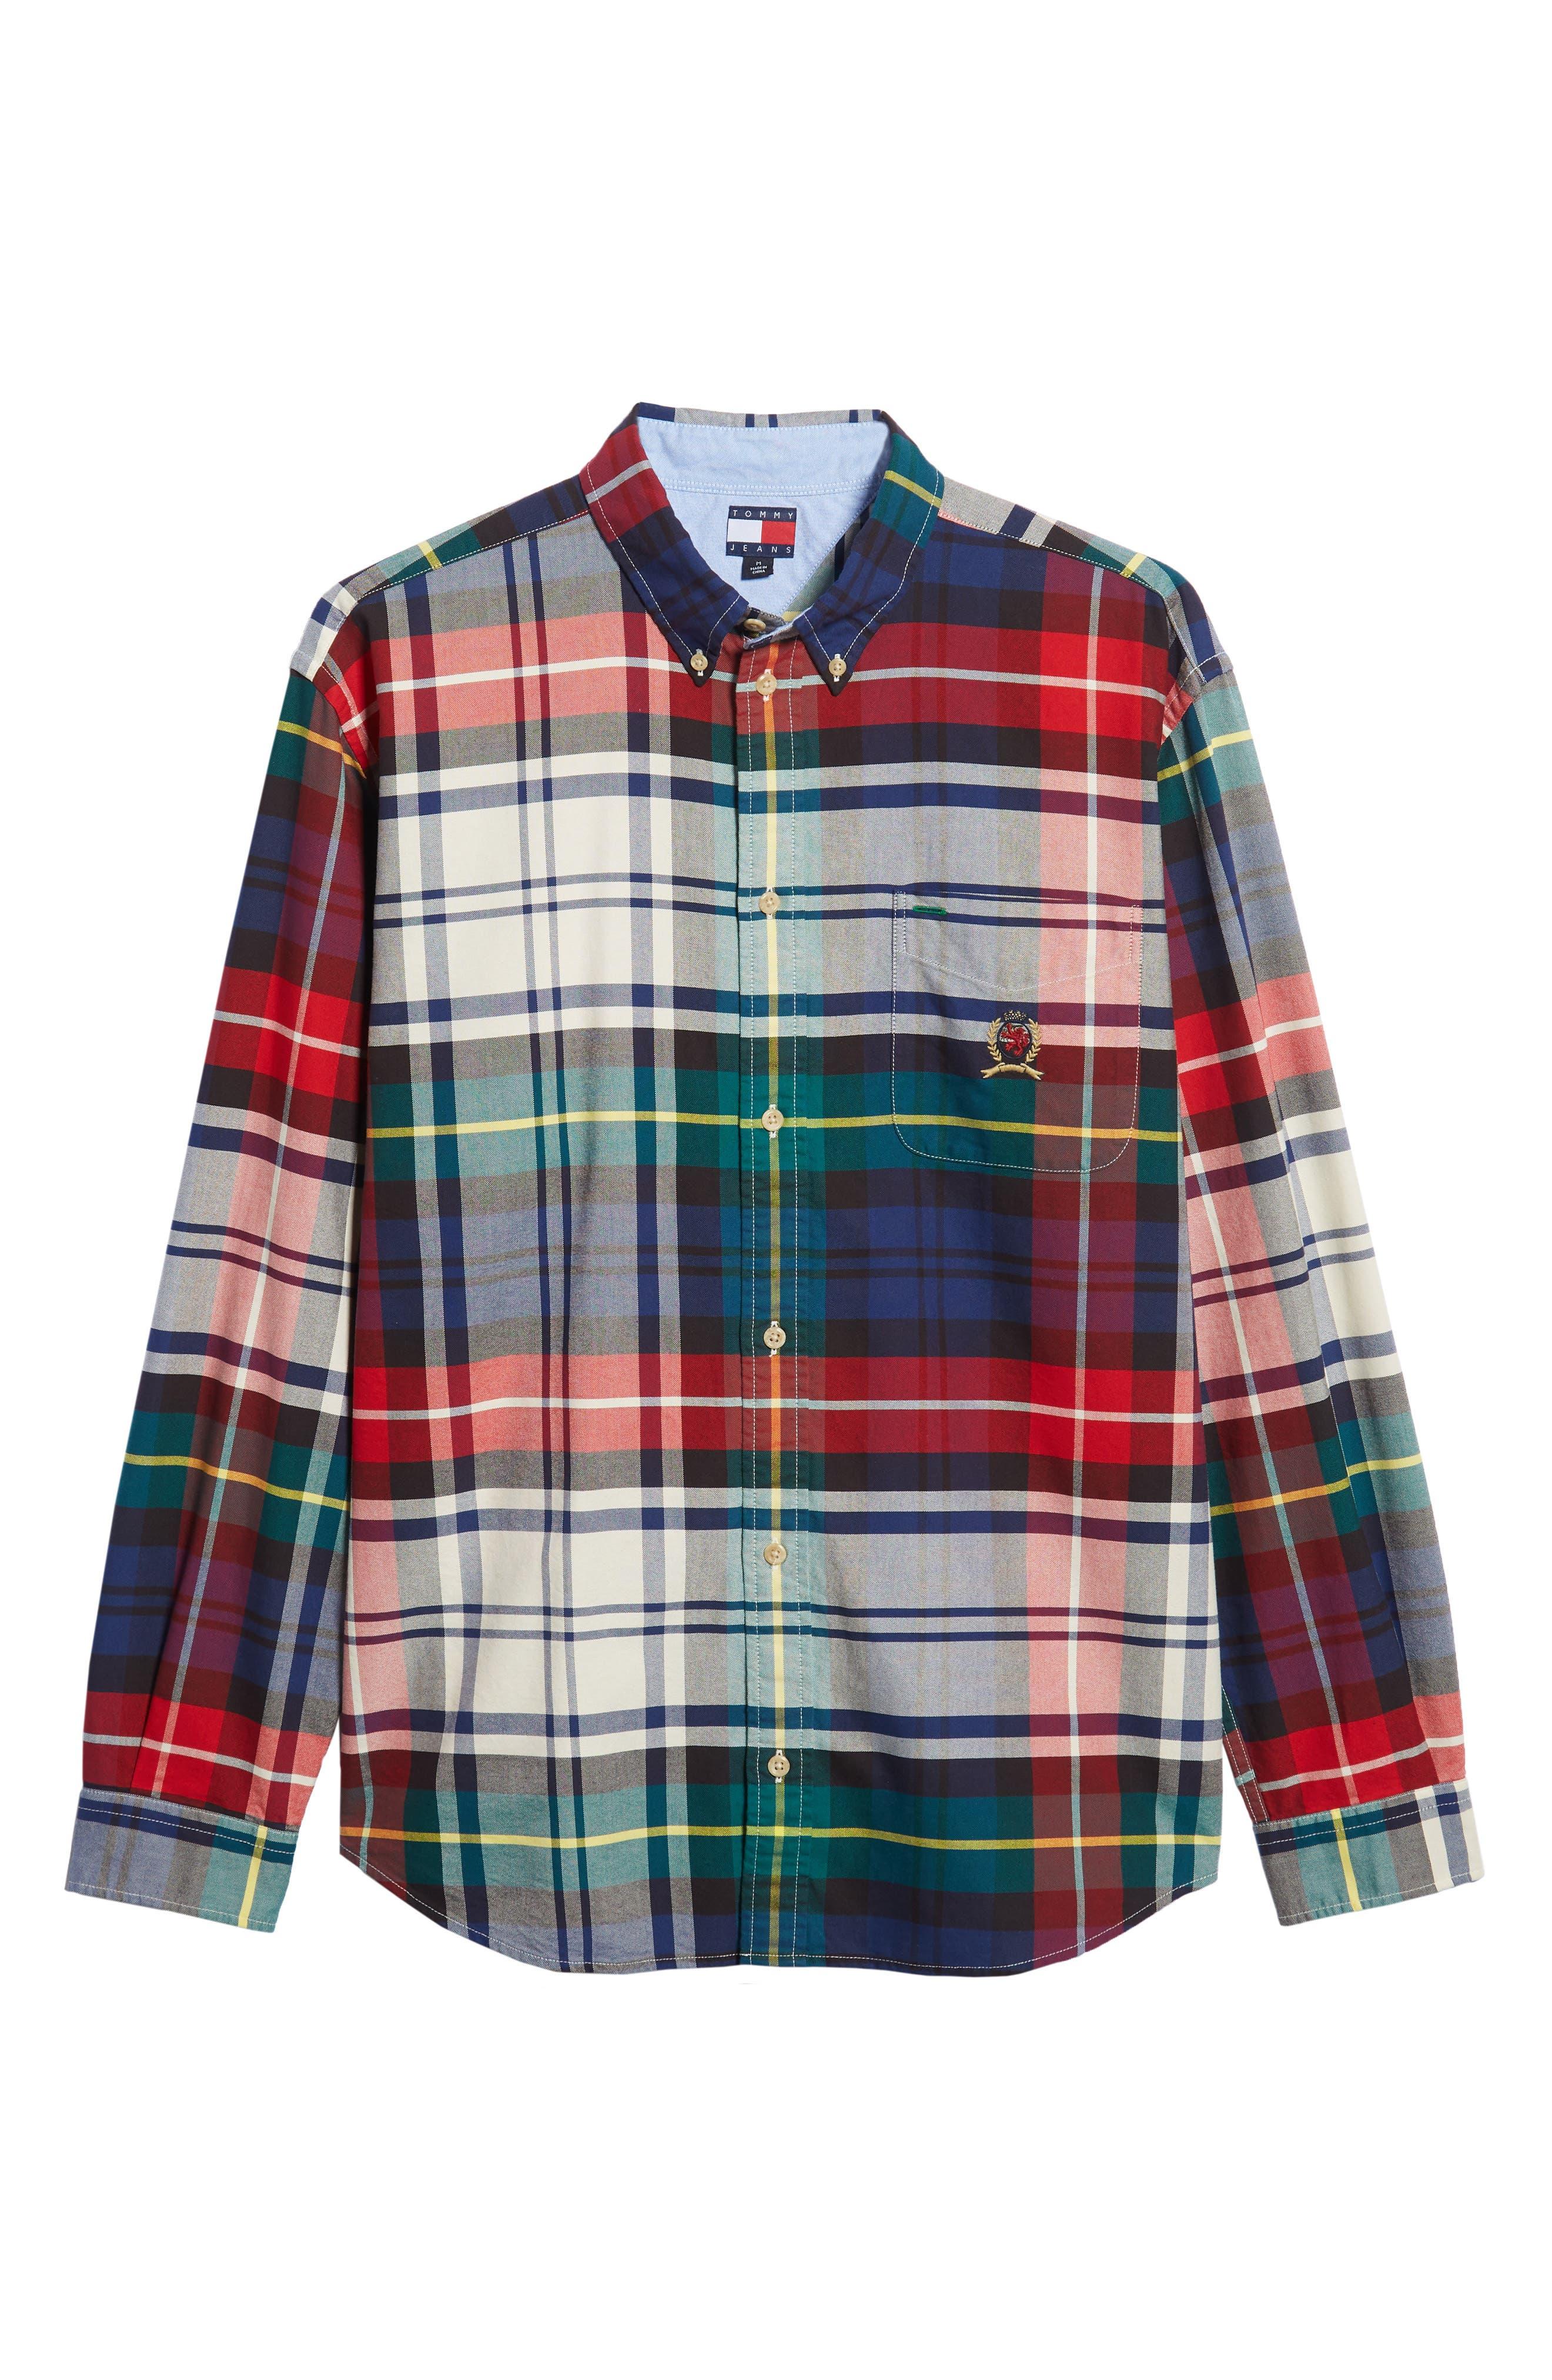 TJM Plaid Crest Sport Shirt,                             Alternate thumbnail 5, color,                             CHECK DARK SAPPHIRE / MULTI